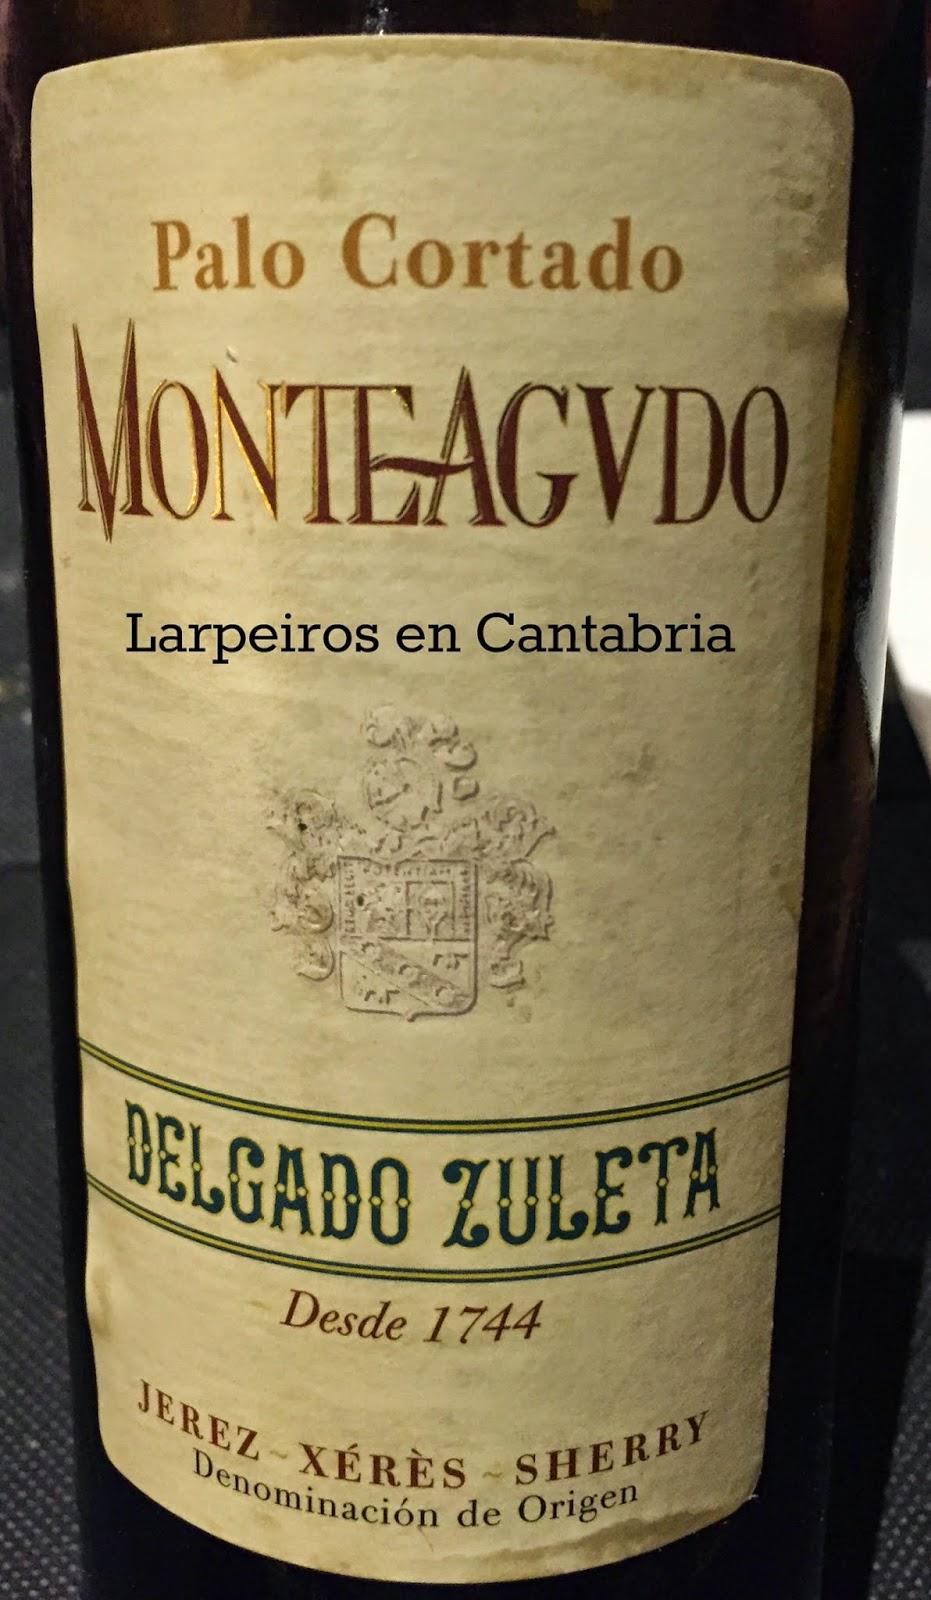 Palo Cortado Monteagudo de Delgado Zuleta: Una pasada de bueno